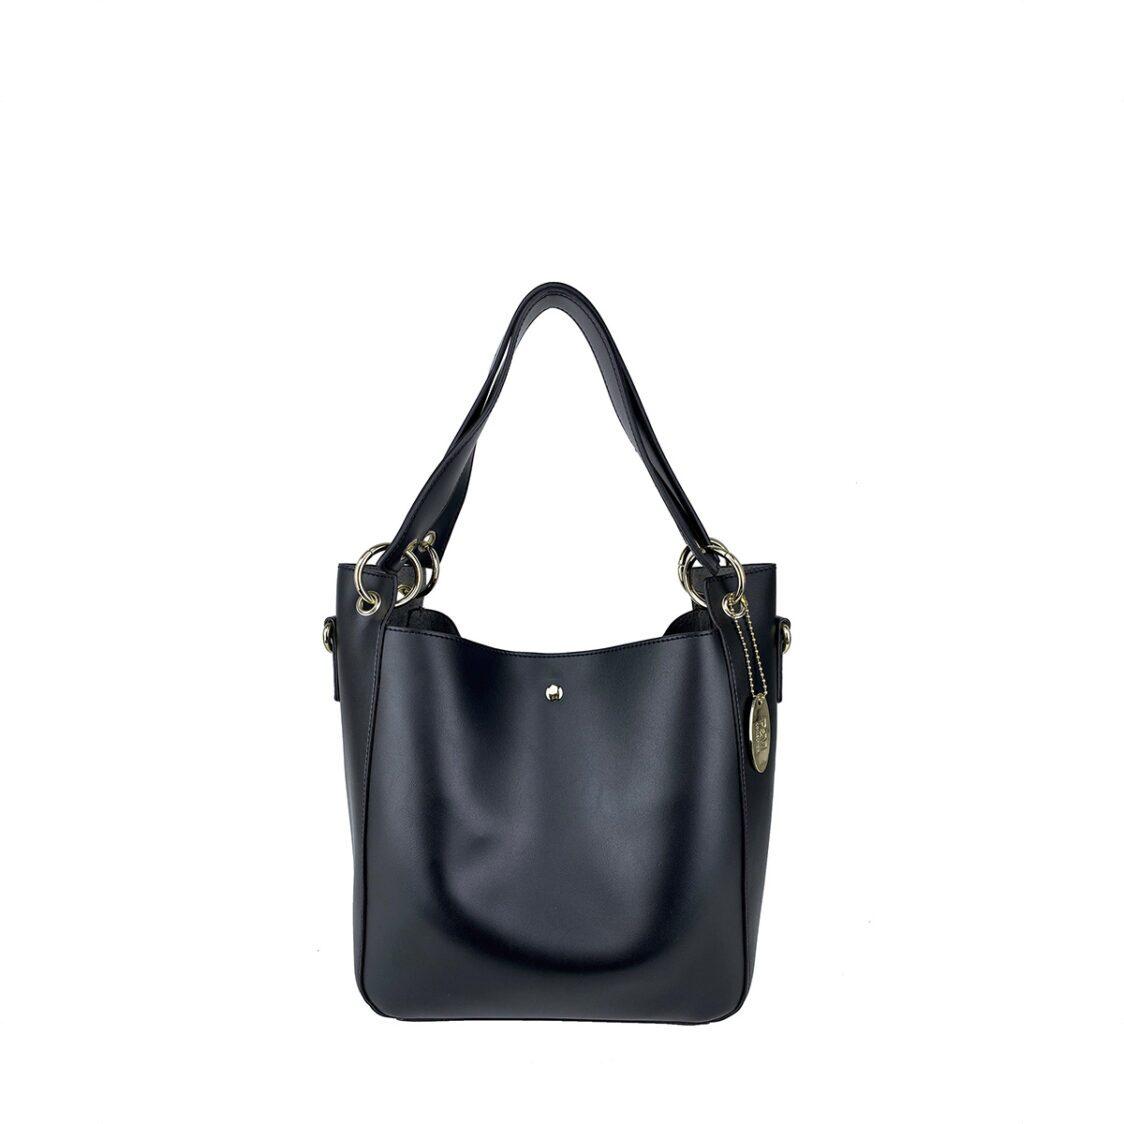 Perllini  Mel Box Calf Leatherette Bag-In-Bag Double Handle Bag With Sling Strap Black